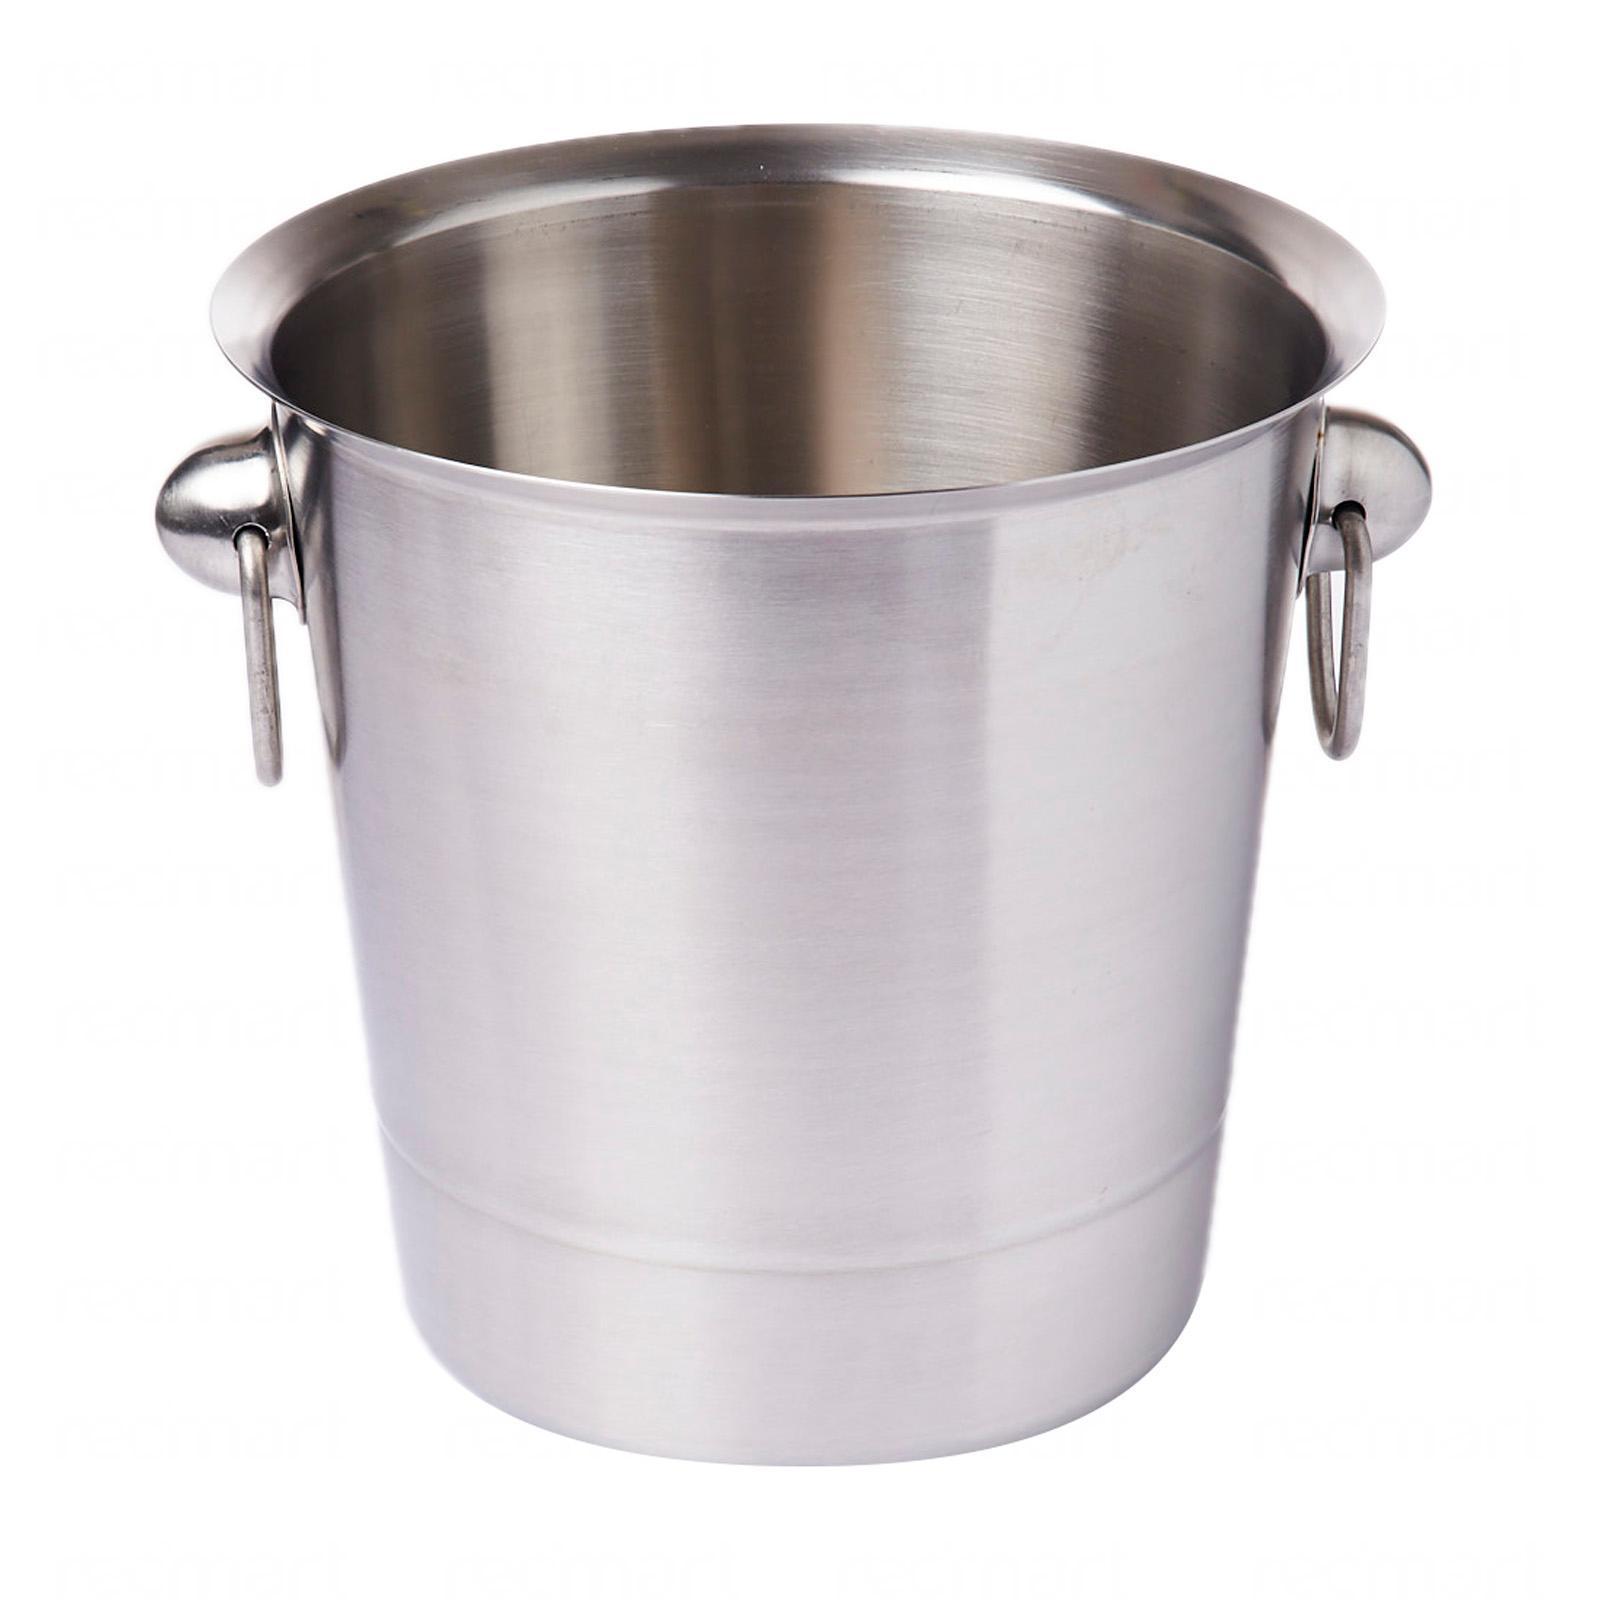 Pujadas Stainless Steel Wine Bucket With Handles 19 CM